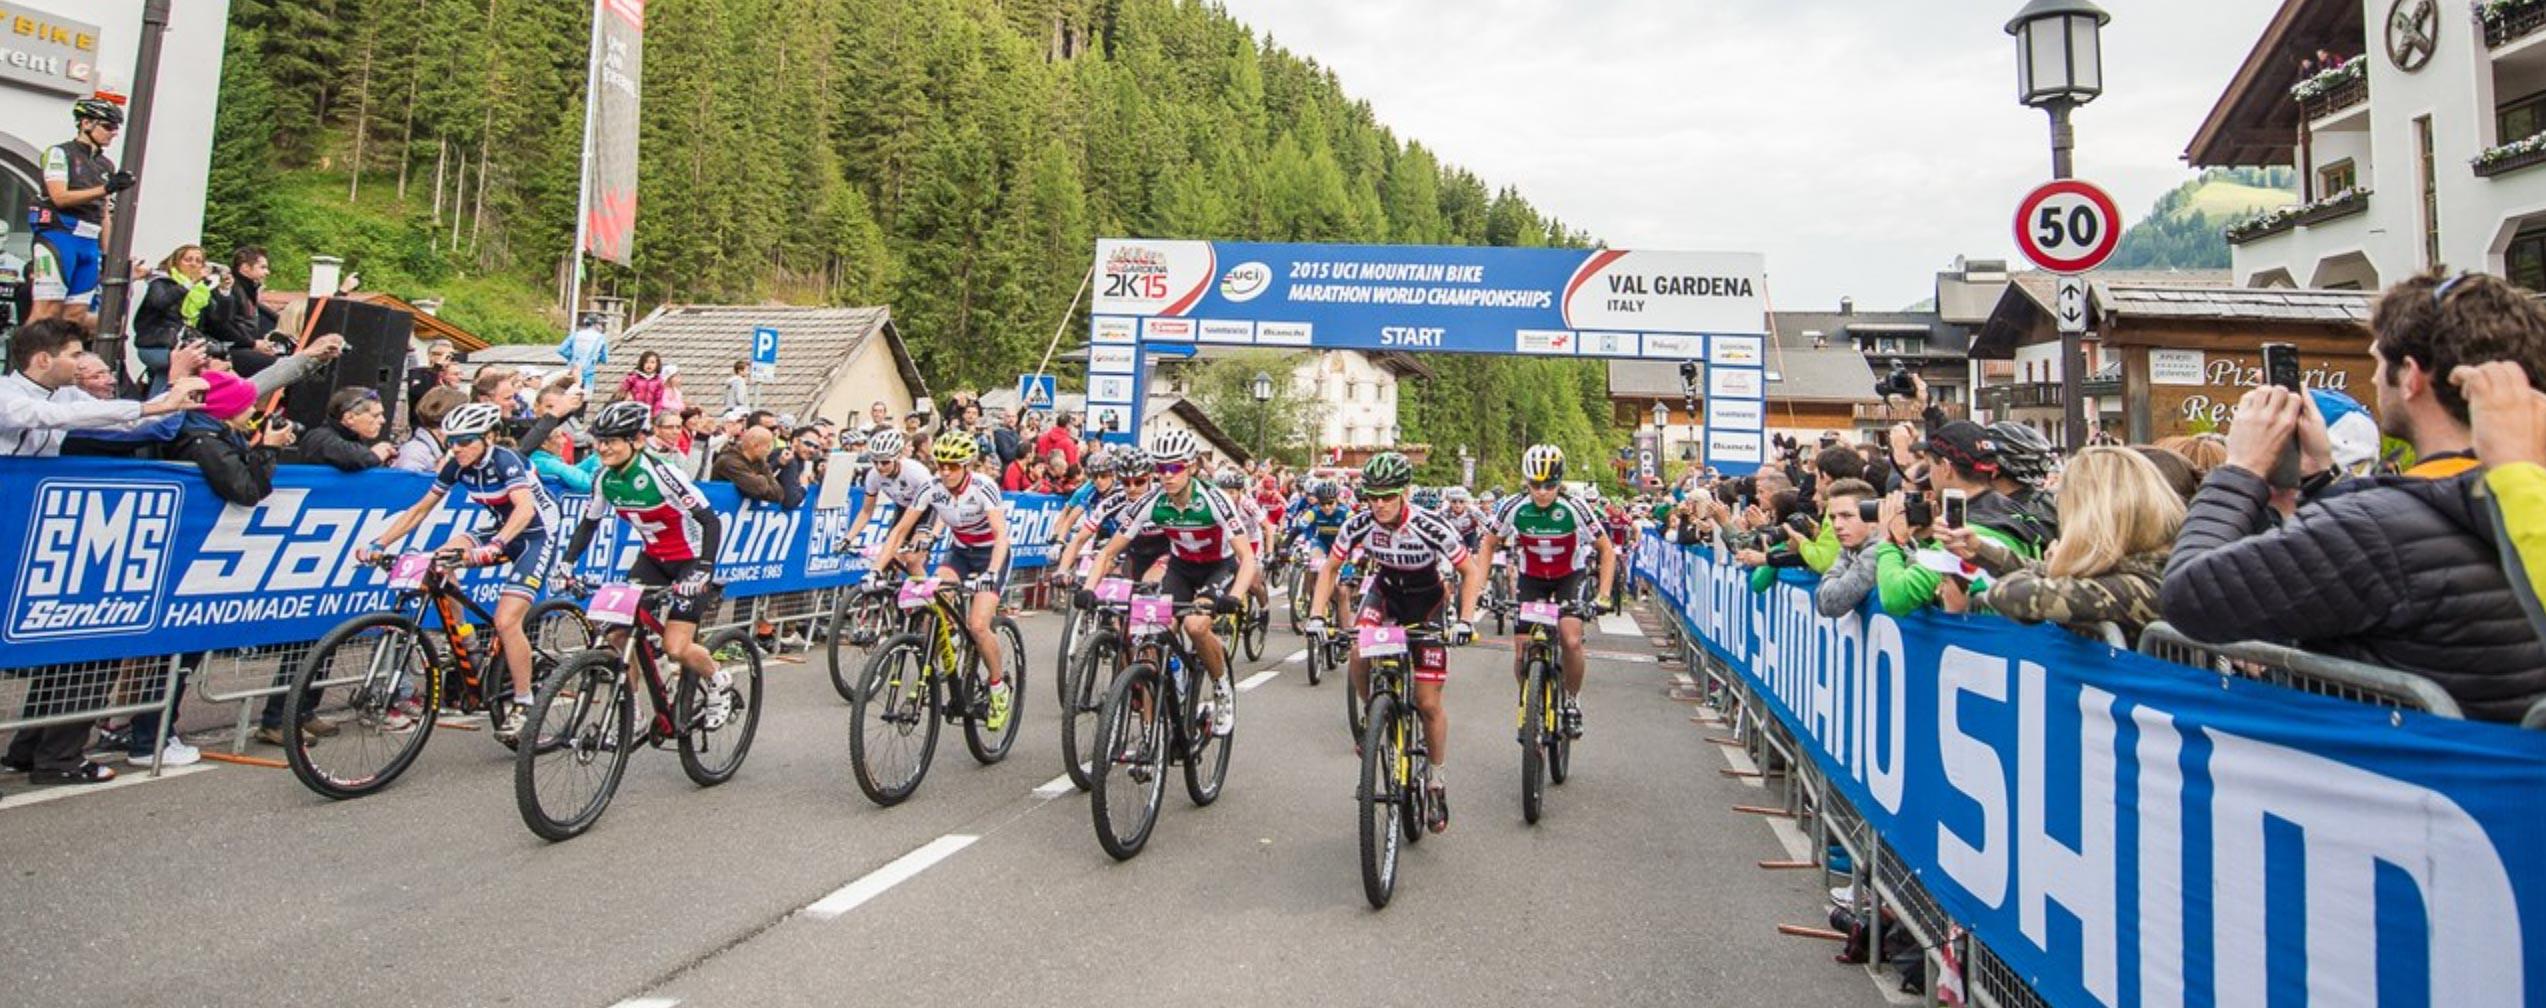 Championnat_Monde_Marathon_2015_Val_Gardena_Copyright_Sella_Ronda_Hero-1-2